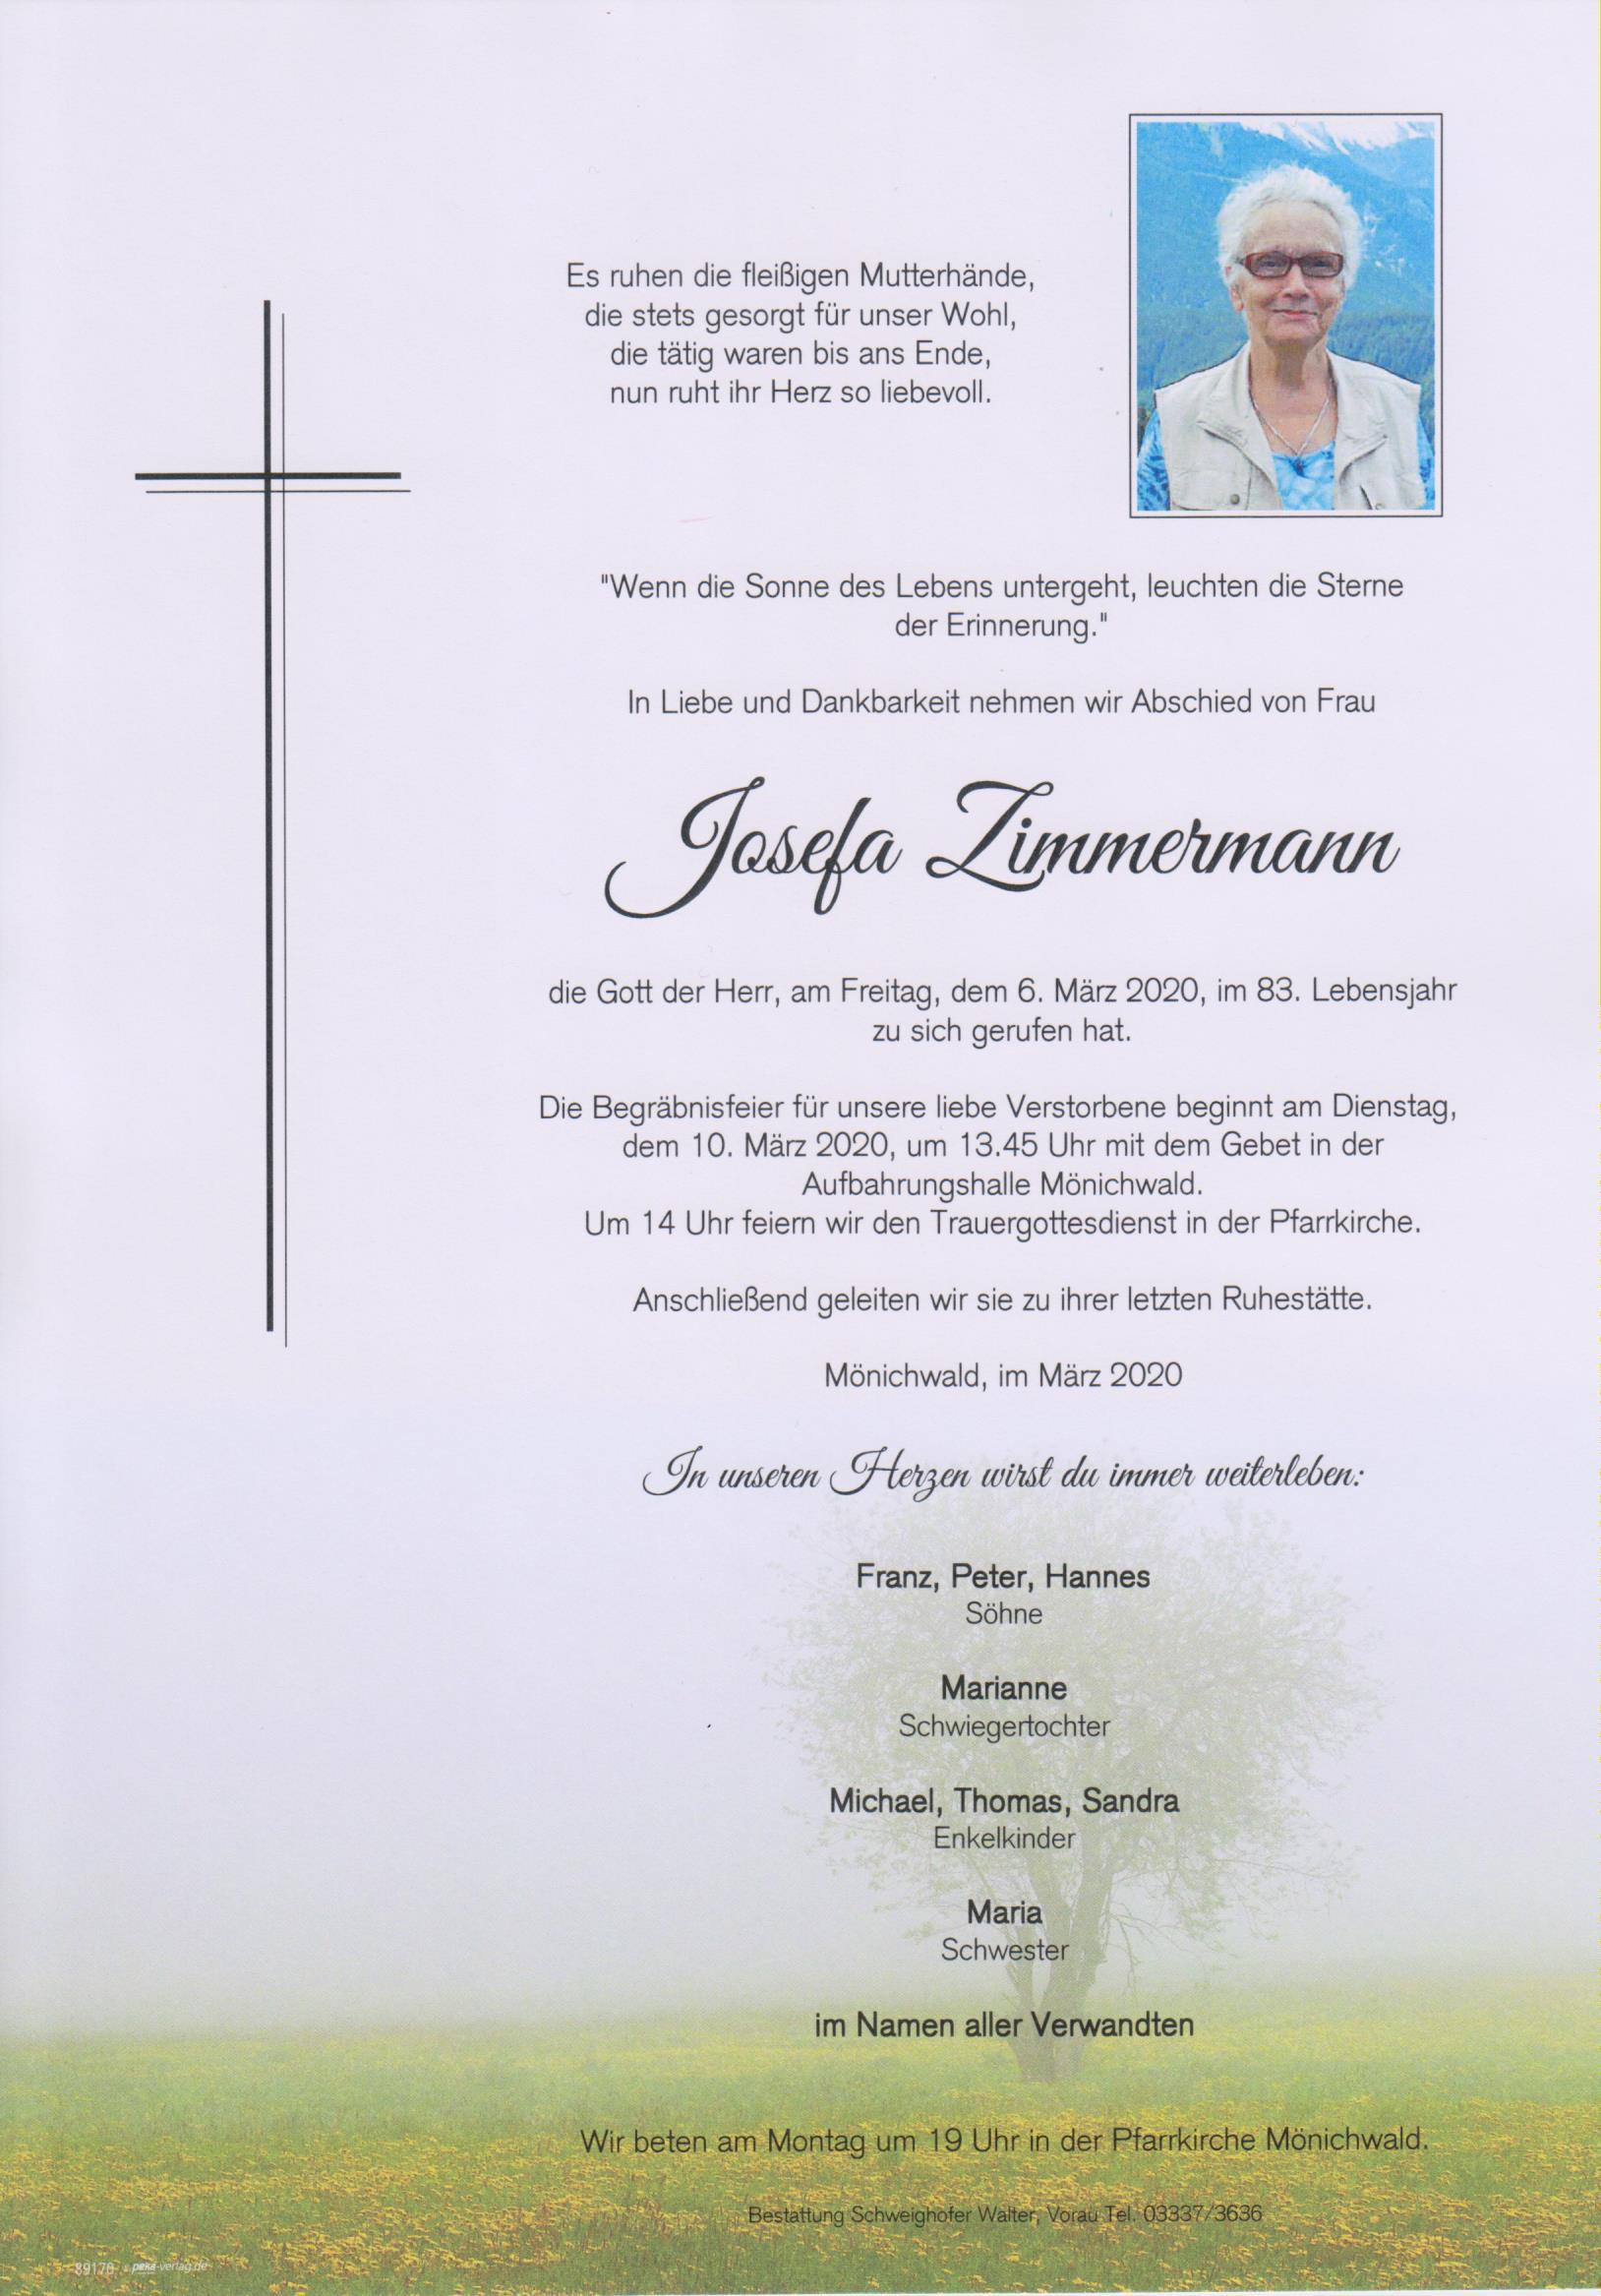 Josefa Zimmermann